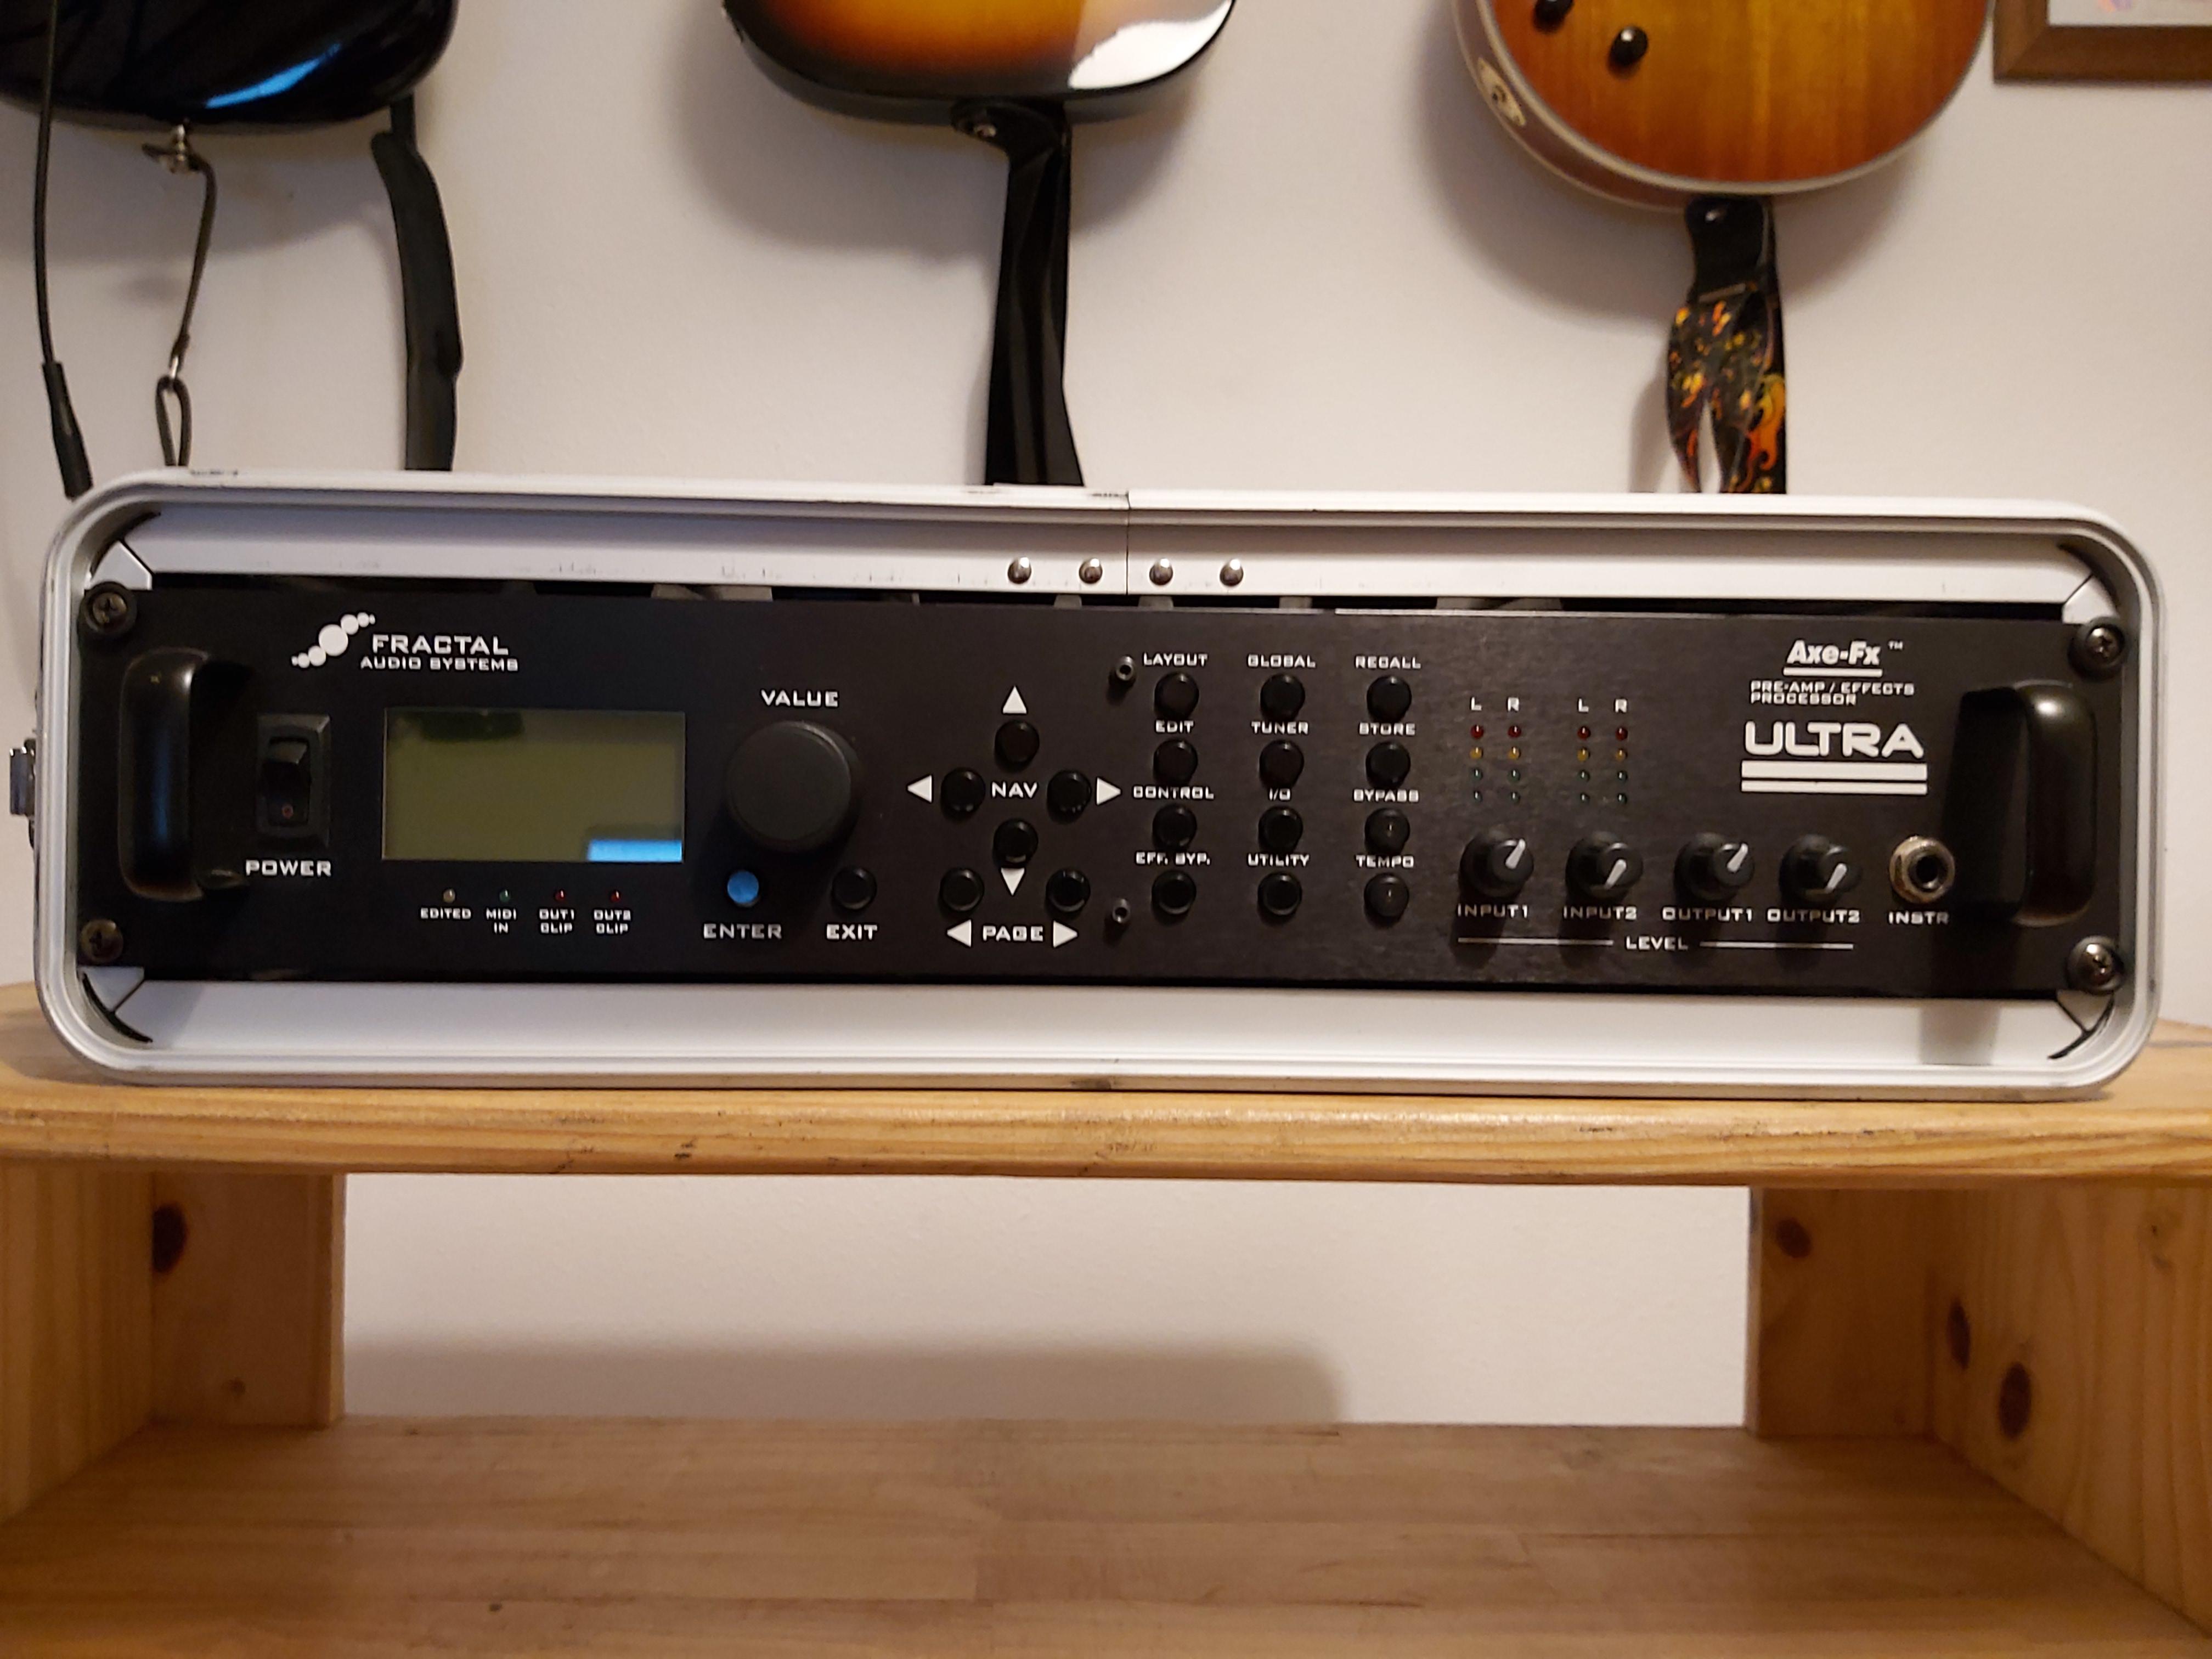 Axe-Fx Ultra - Fractal Audio Systems Axe-Fx Ultra